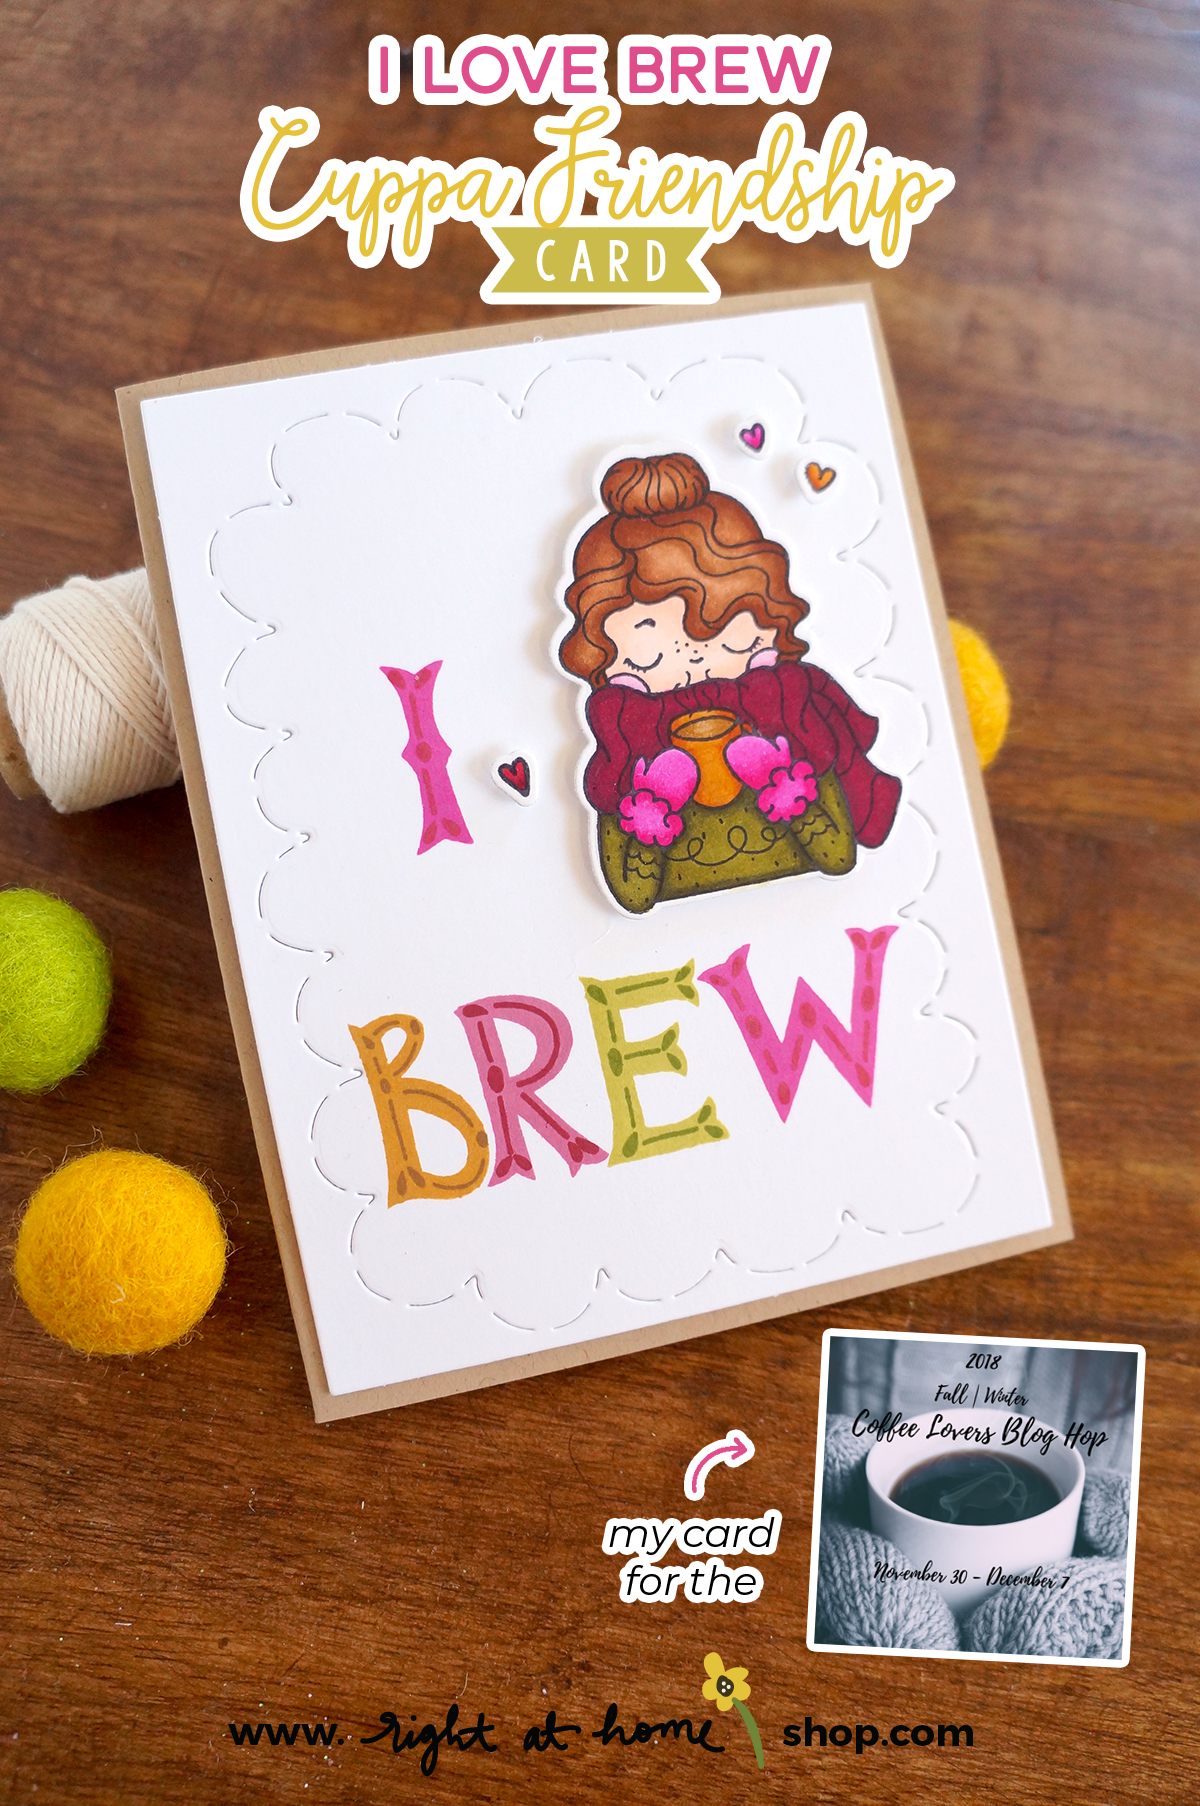 I Love Brew Cuppa Friendship Card for the 2018 Fall | Winter Coffee Lovers Blog Hop on www.rightathomeshop.com/blog